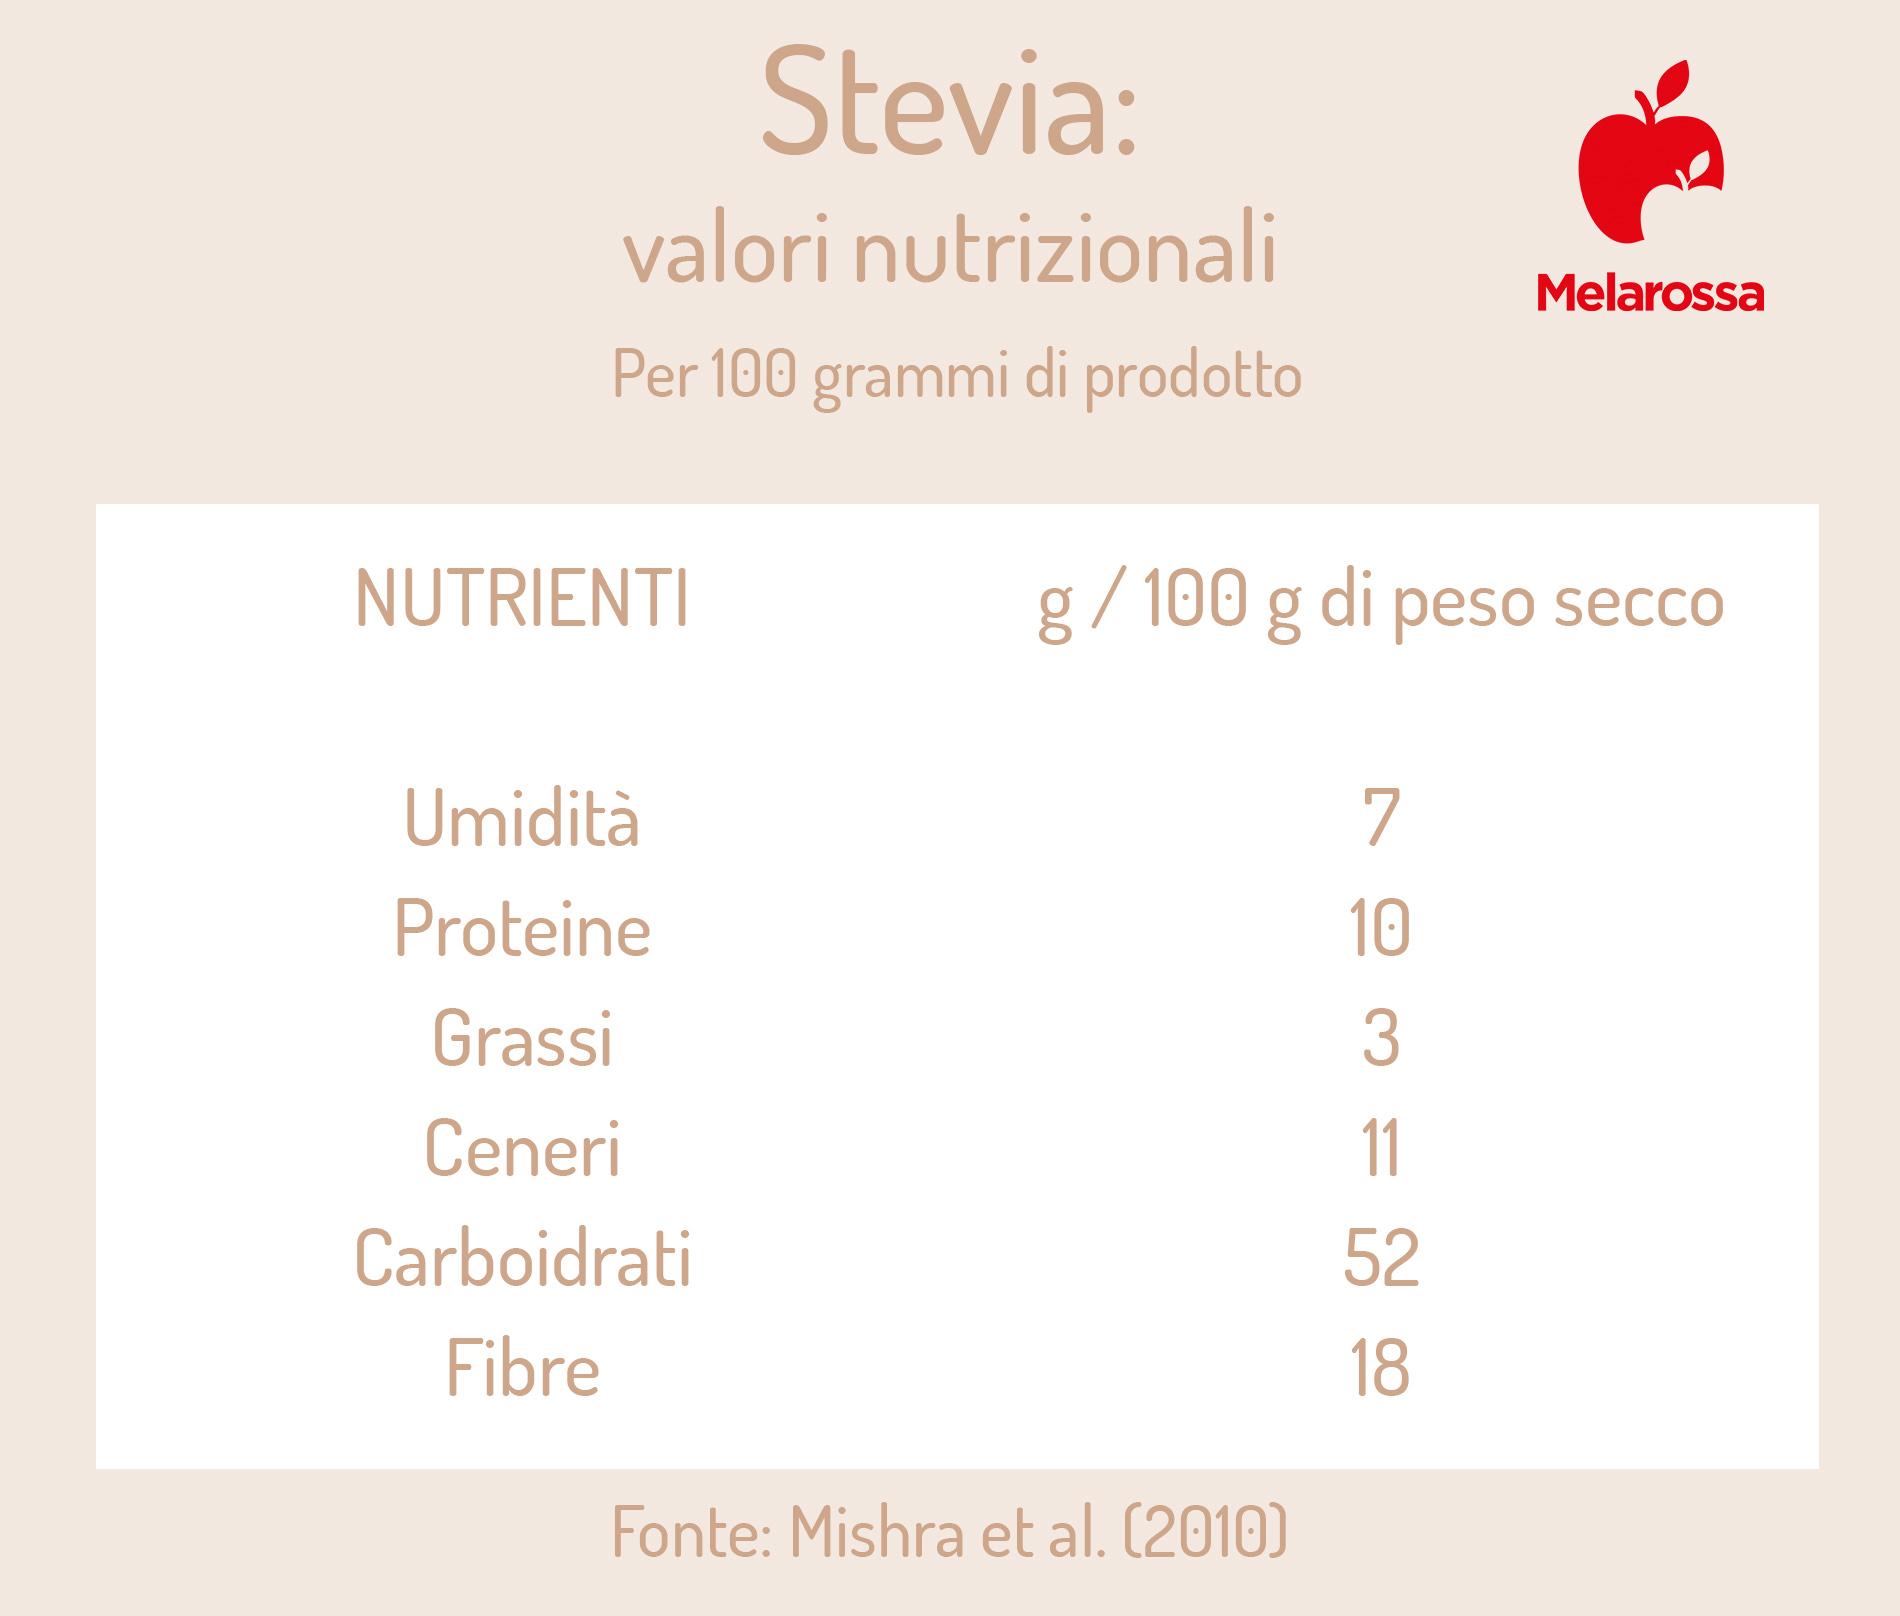 stevia: valori nutrizionali